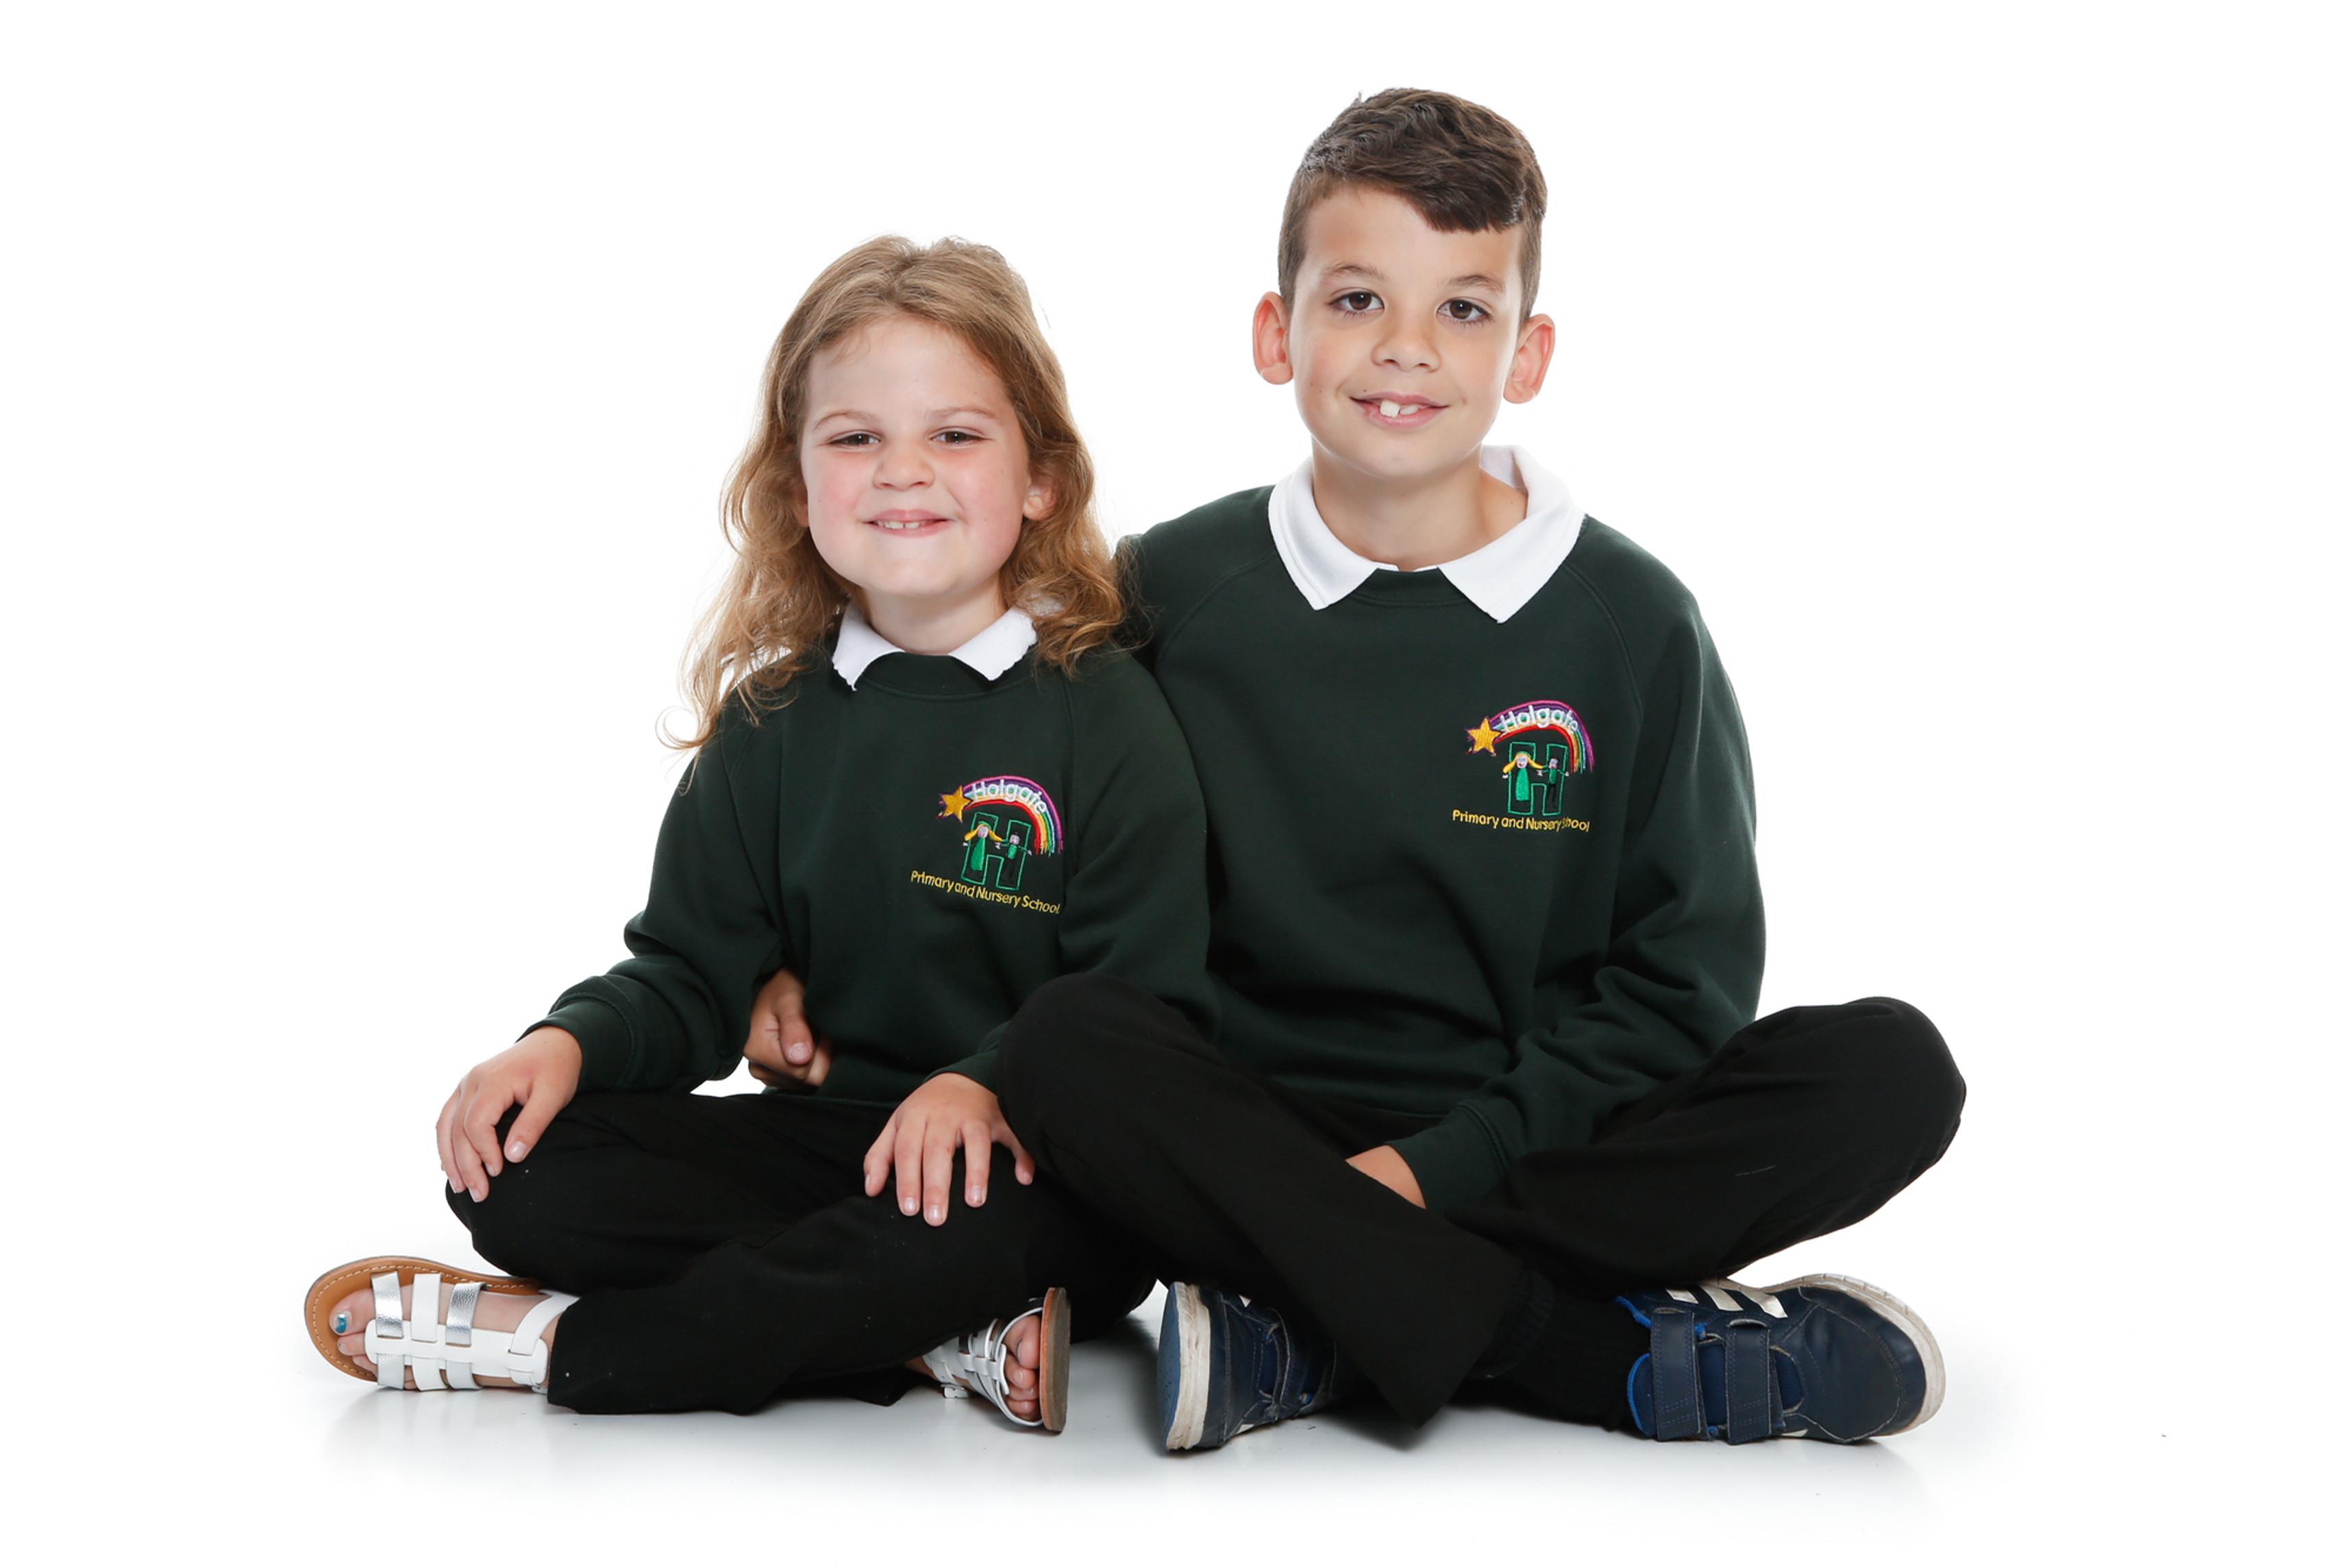 School Photos - July 21 - Brinsley